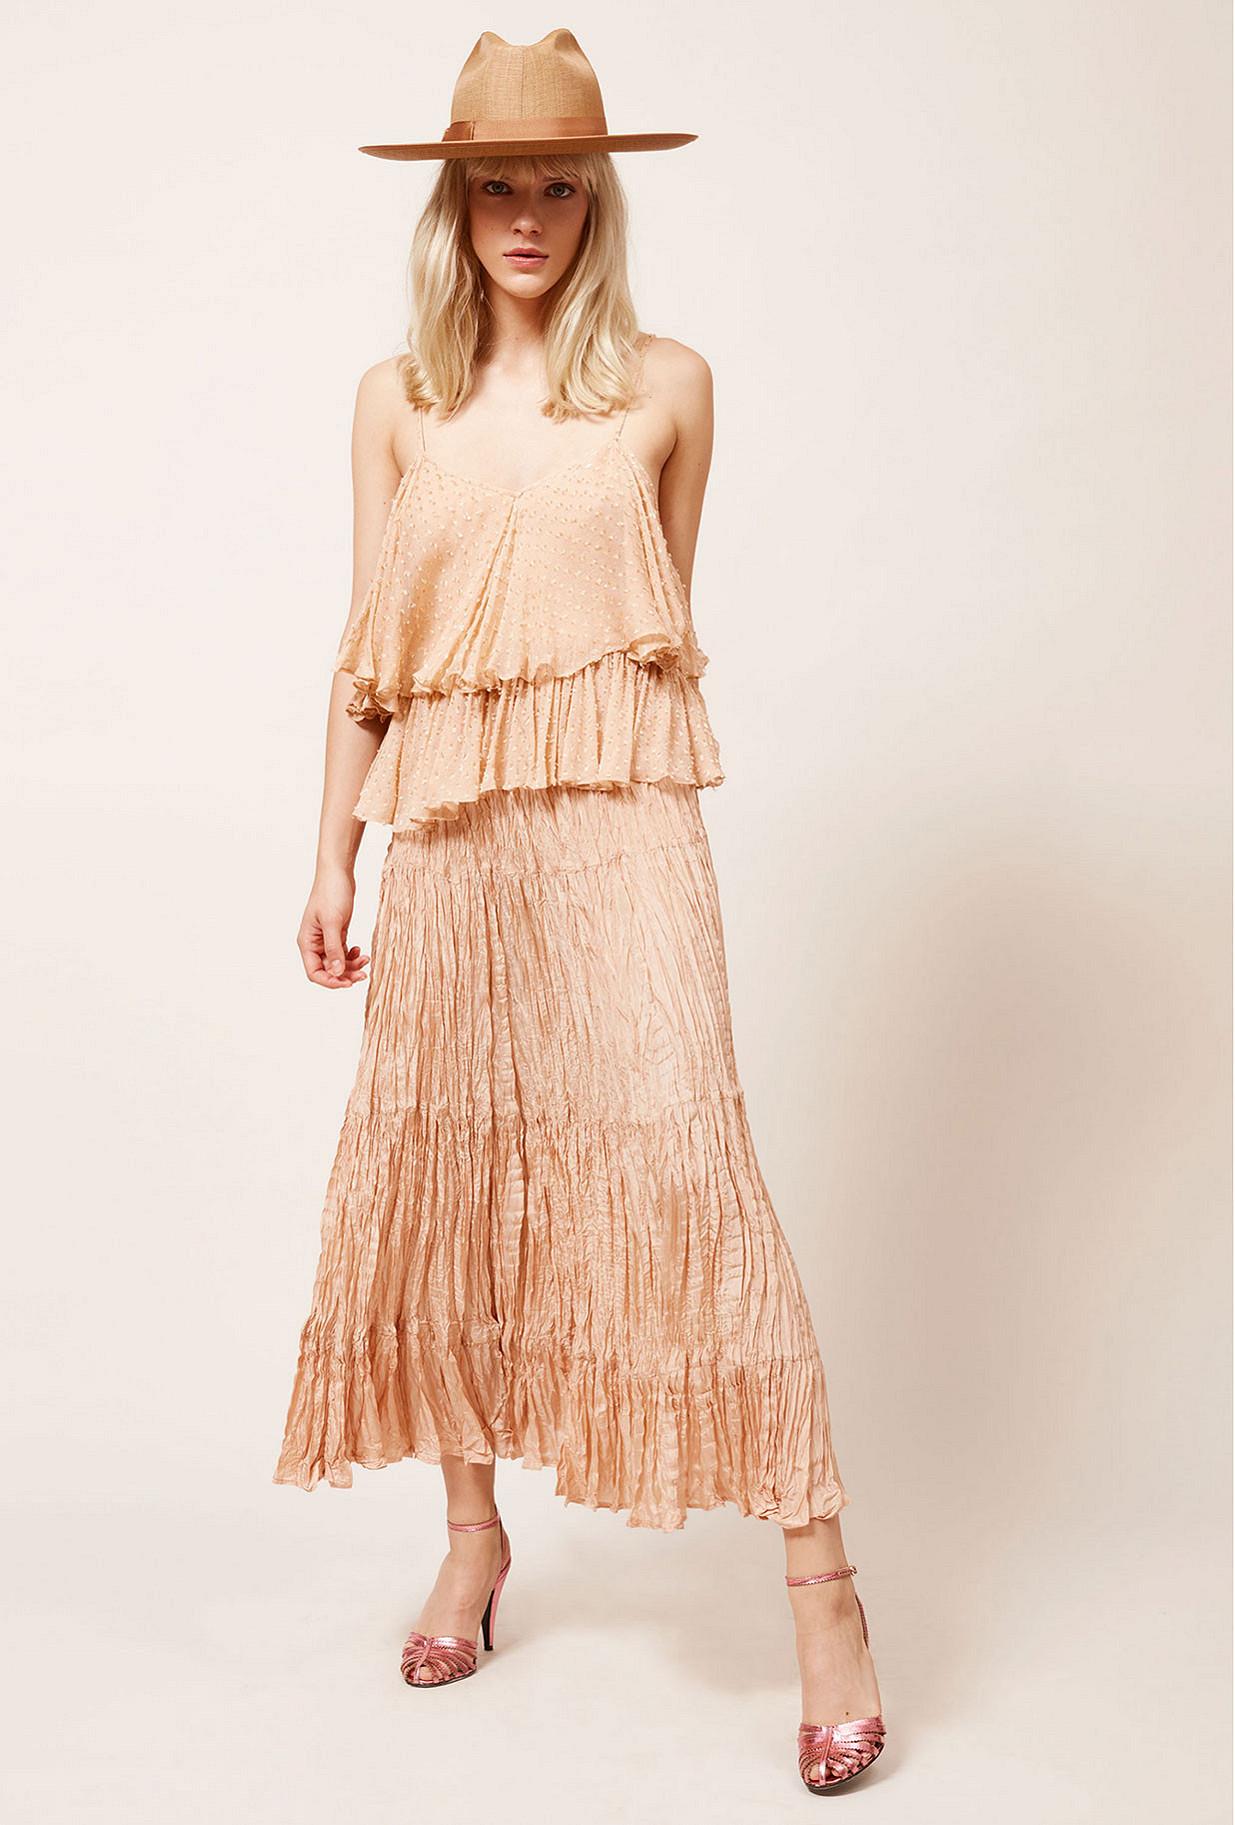 Paris clothes store Skirt  Shamadan french designer fashion Paris